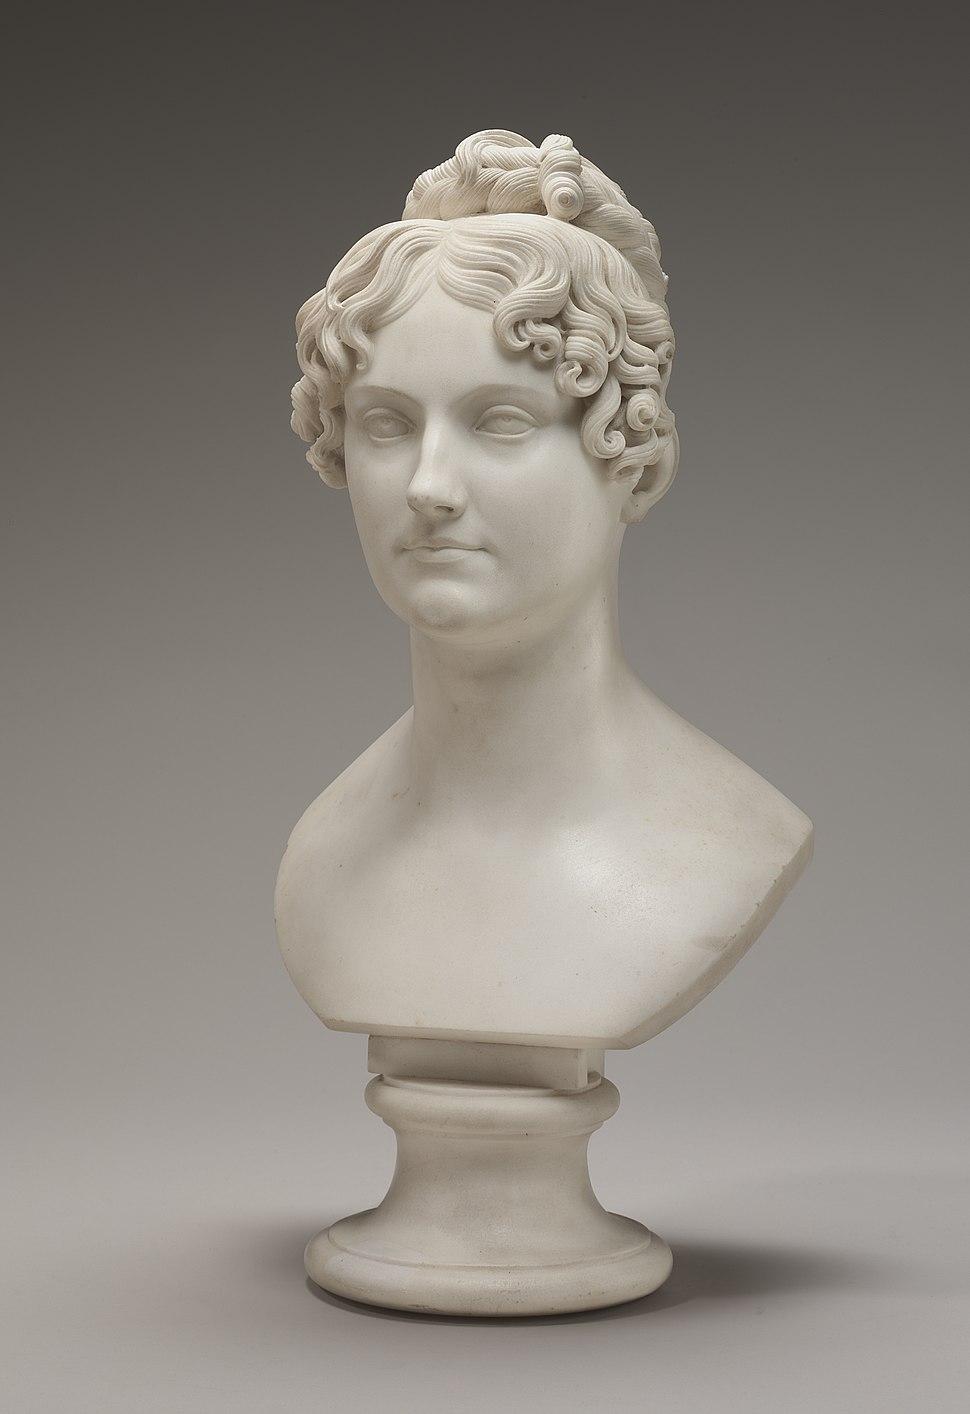 Bertel Thorvaldsen, Possibly Lady Georgiana Bingham, carved c. 1821-1824, NGA 156639